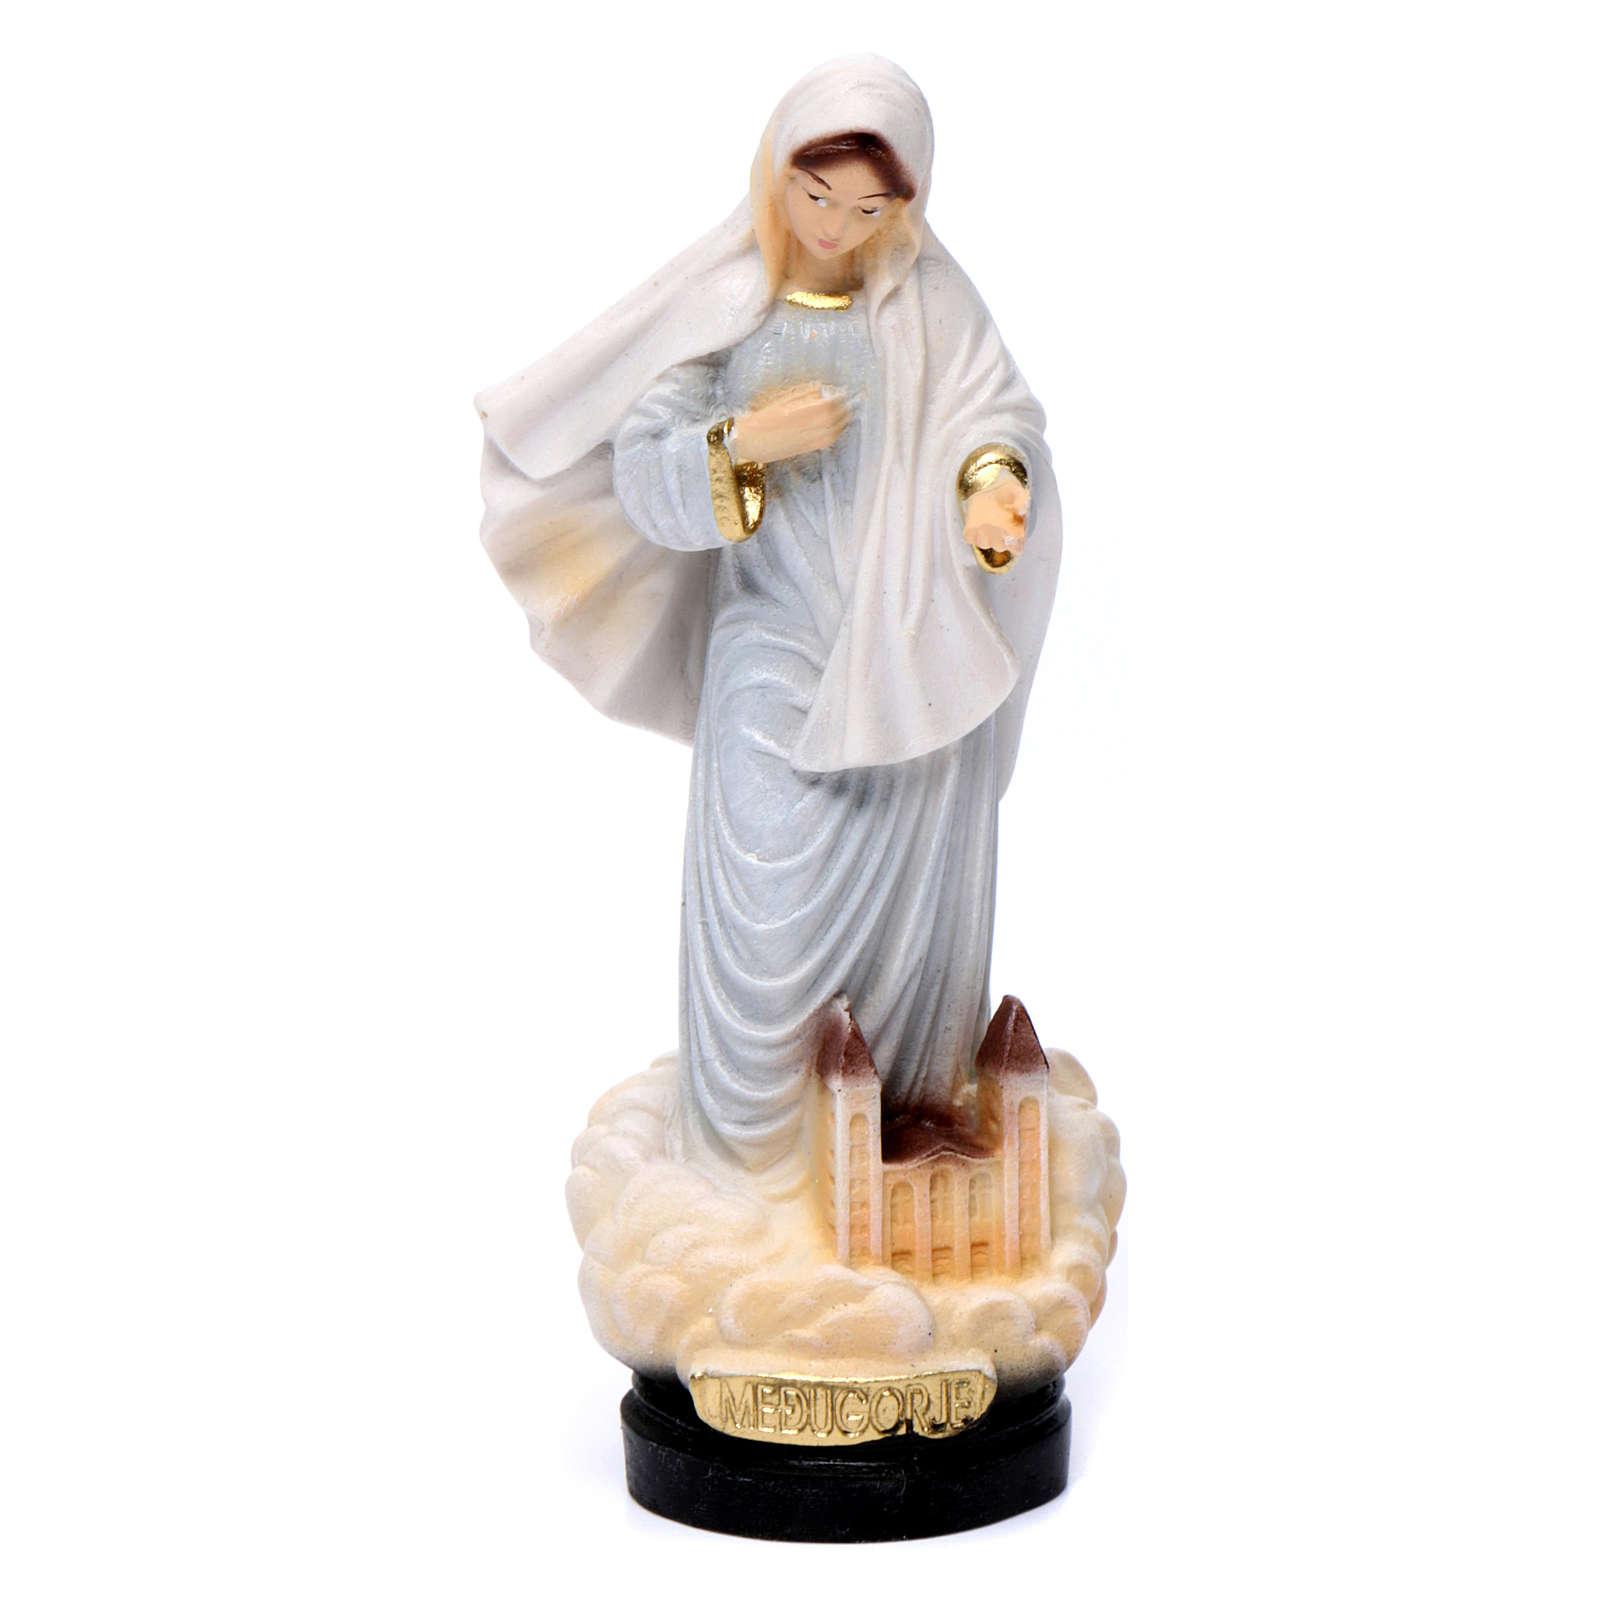 Statua Madonna di Medjugorje 12 cm manto grigio 4